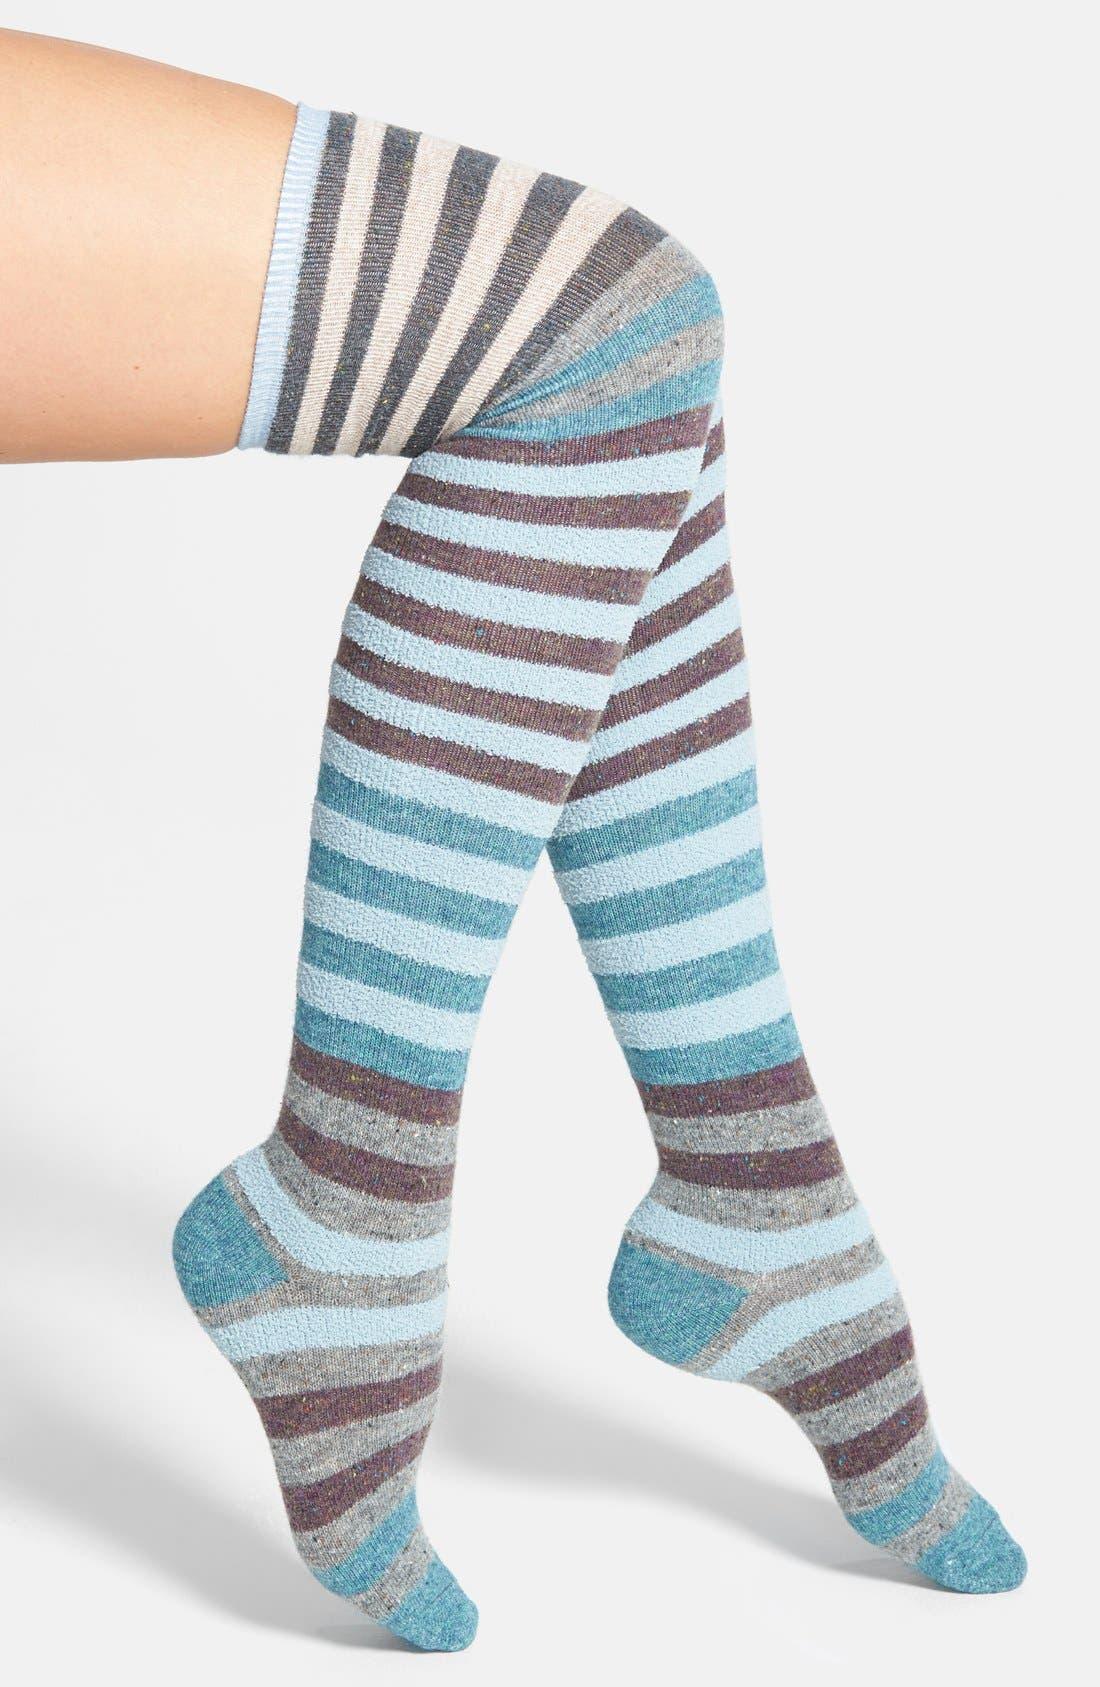 Main Image - LEMON 'Playground' Stripe Over The Knee Socks